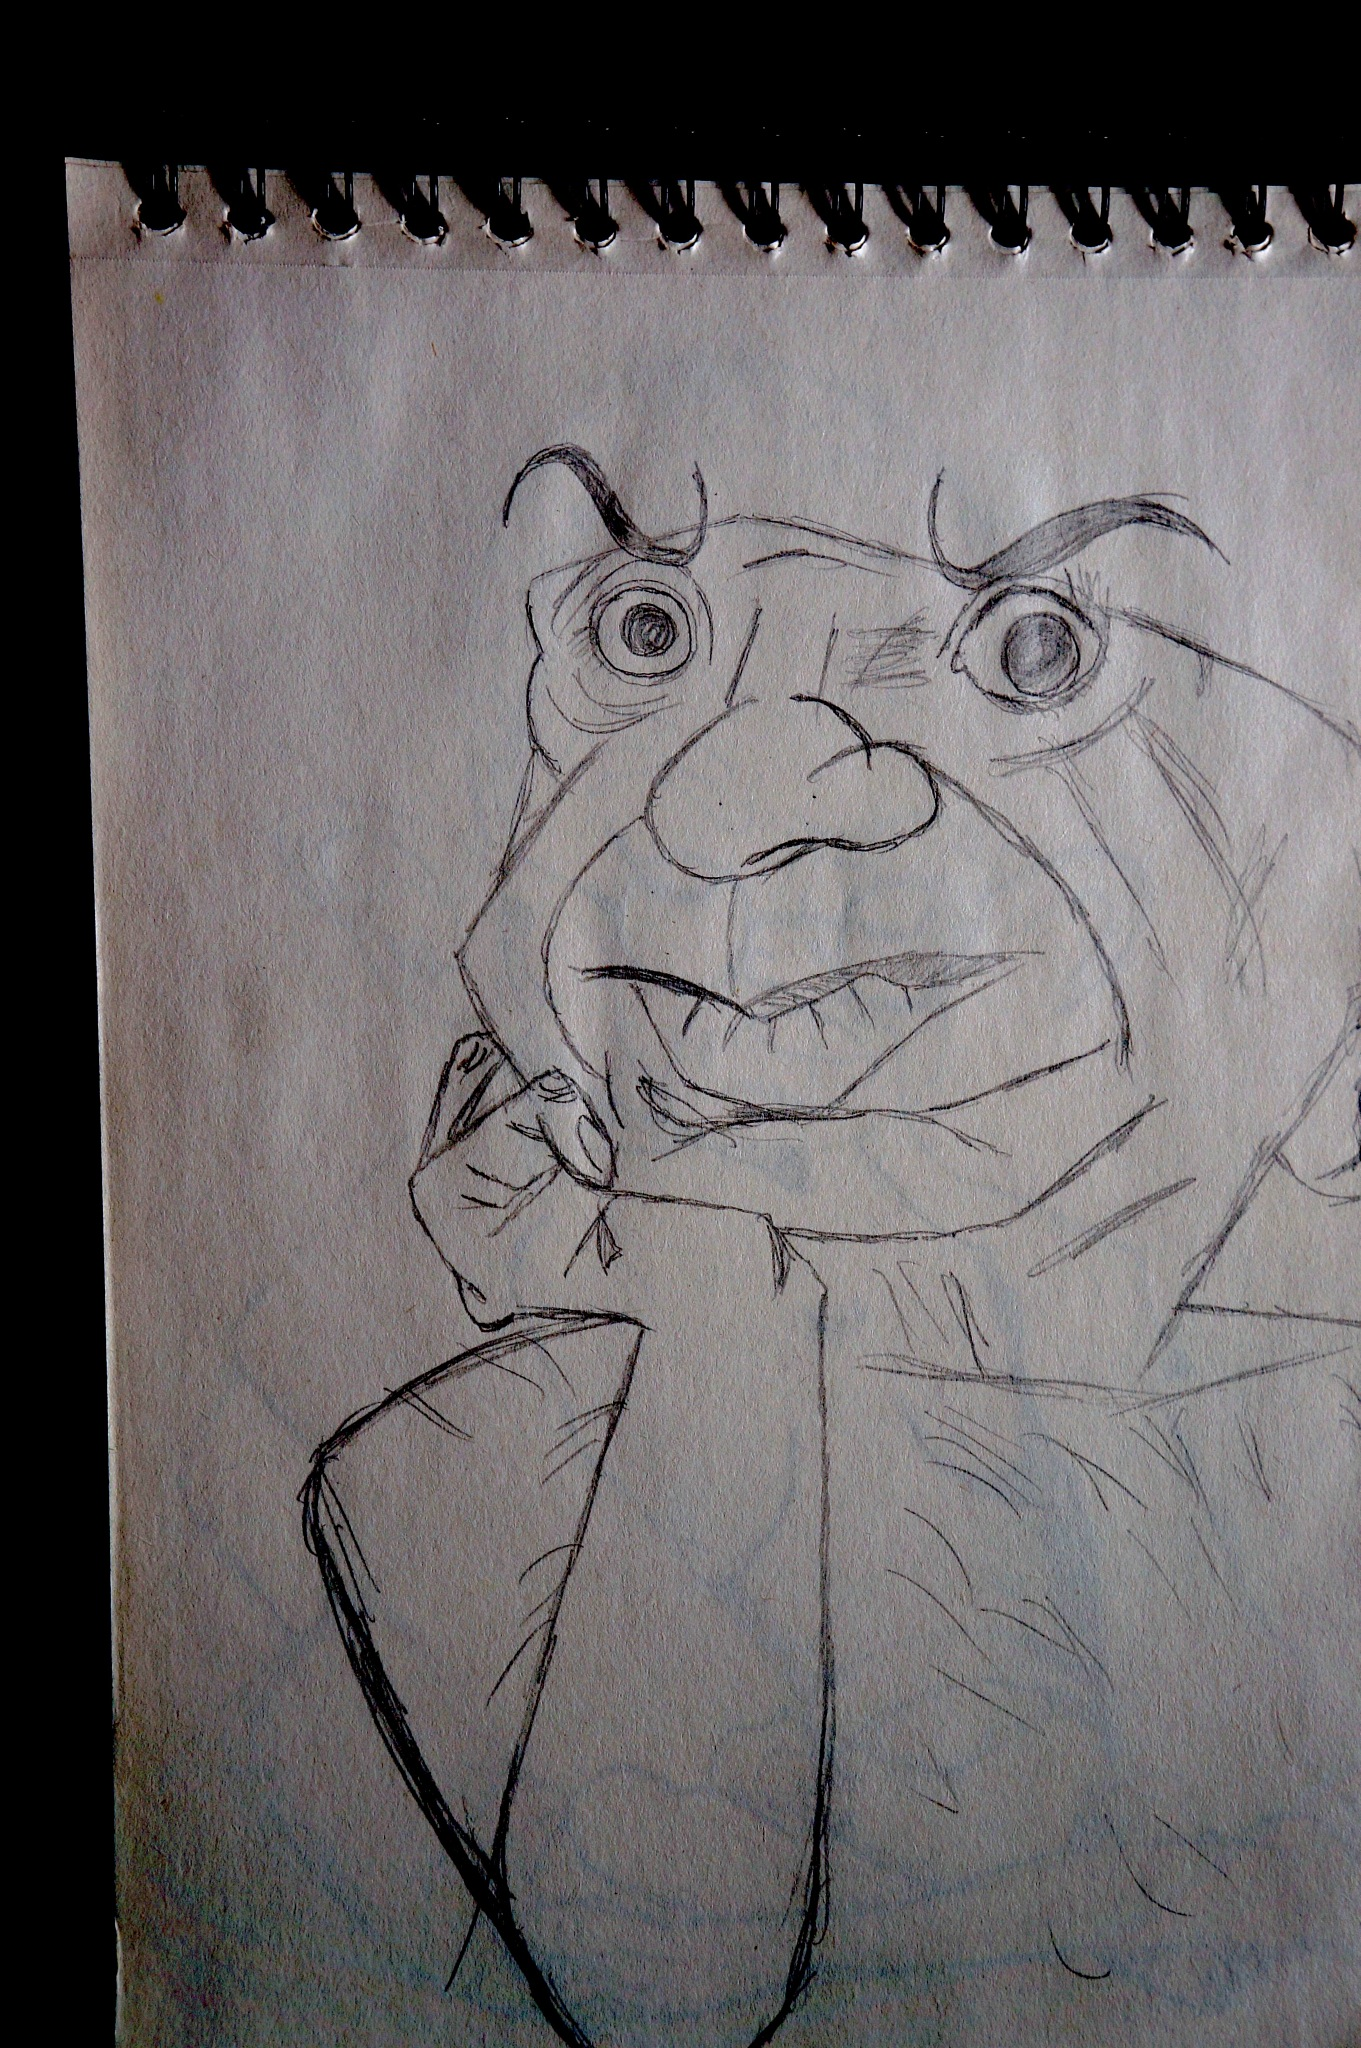 Picasso (sketch) by Kmilo